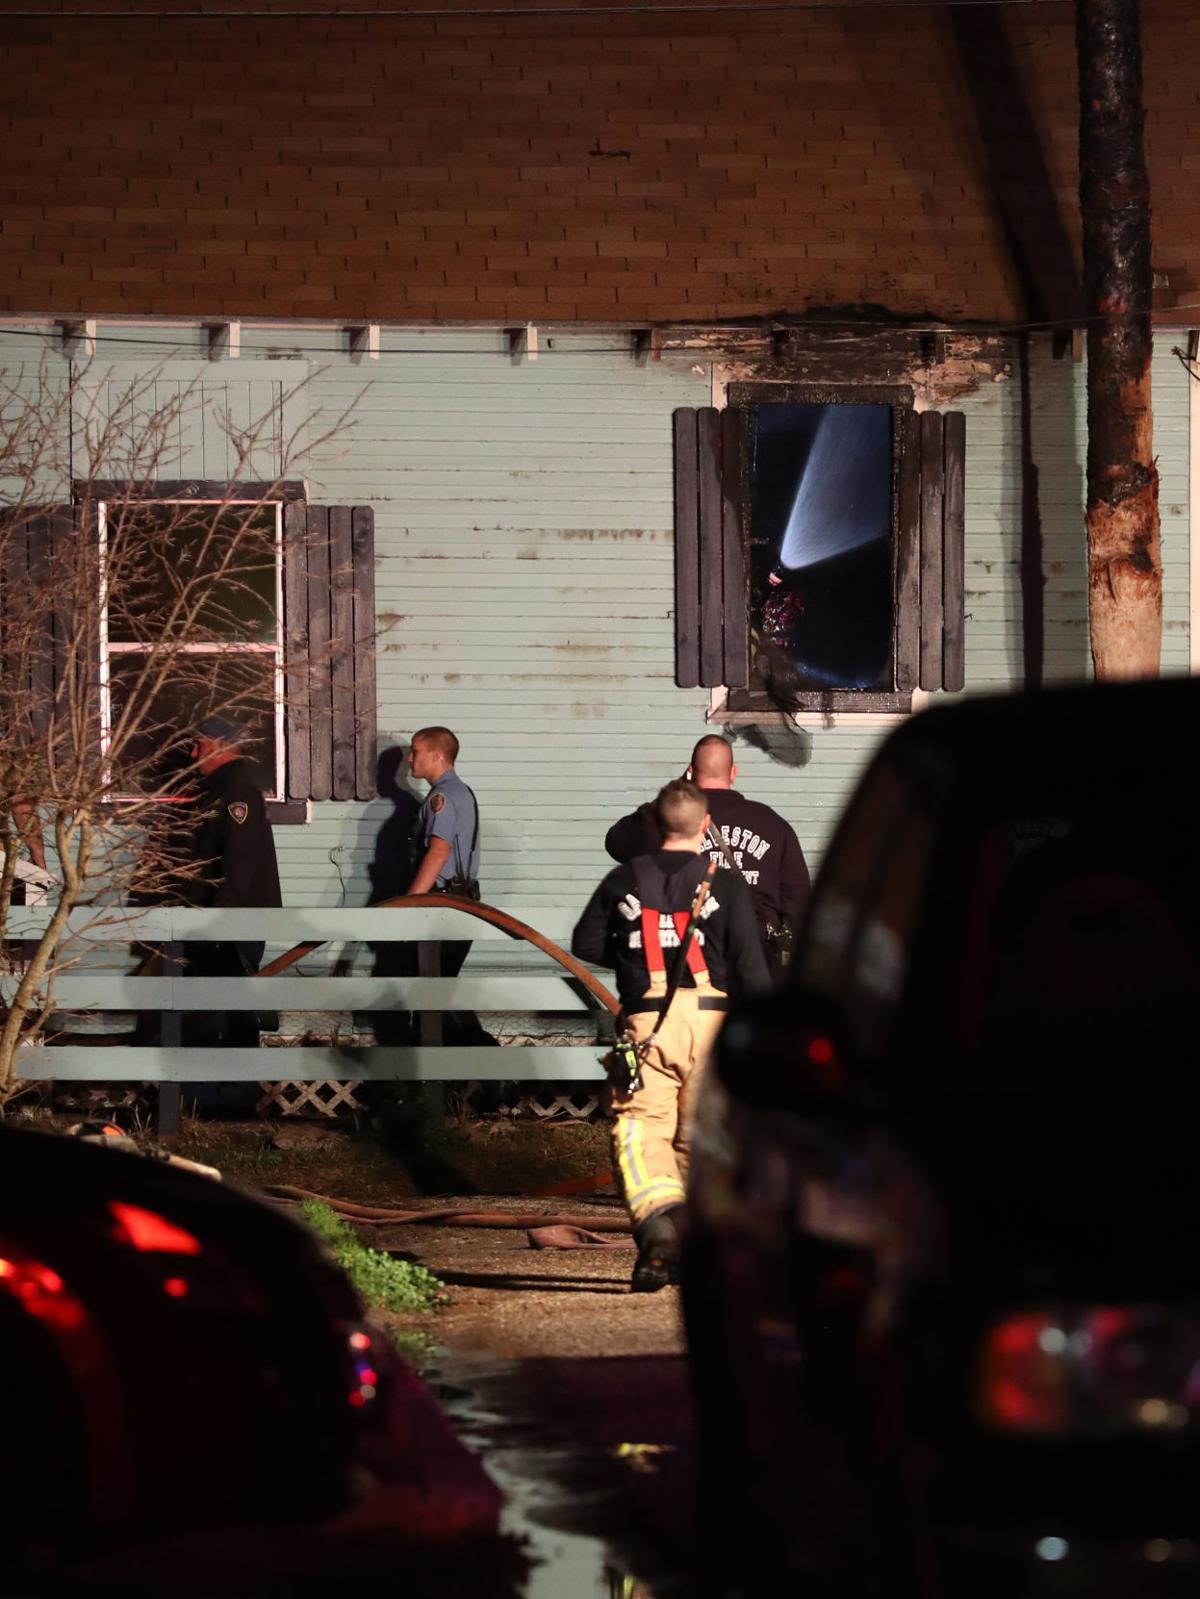 Man dies in Galveston house fire